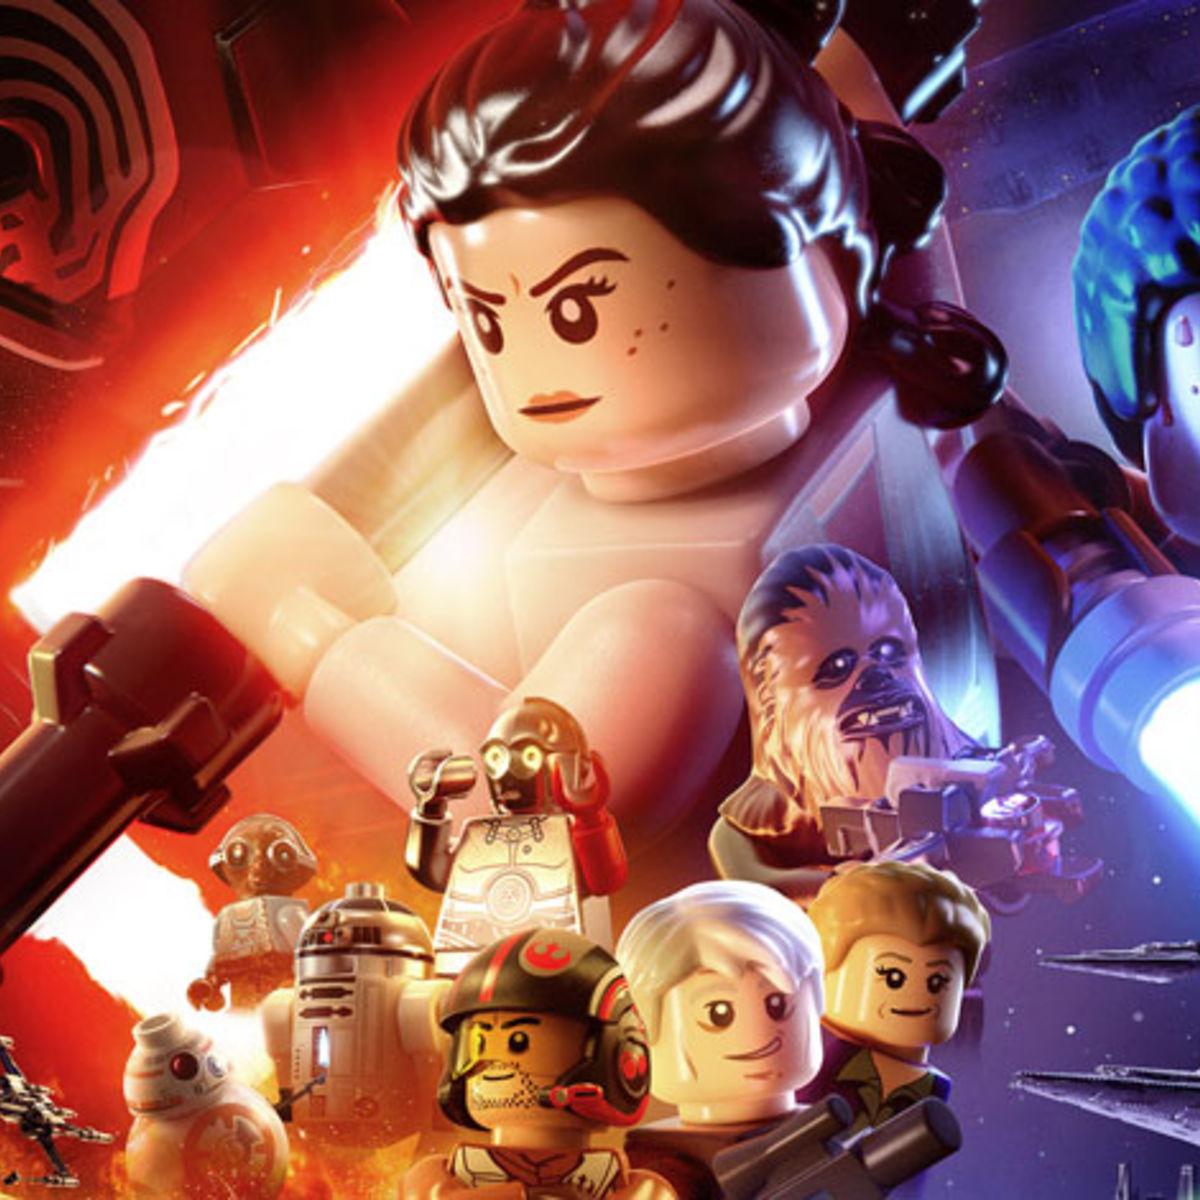 Lego-Star-Wars-The-Force-Awakens.jpg